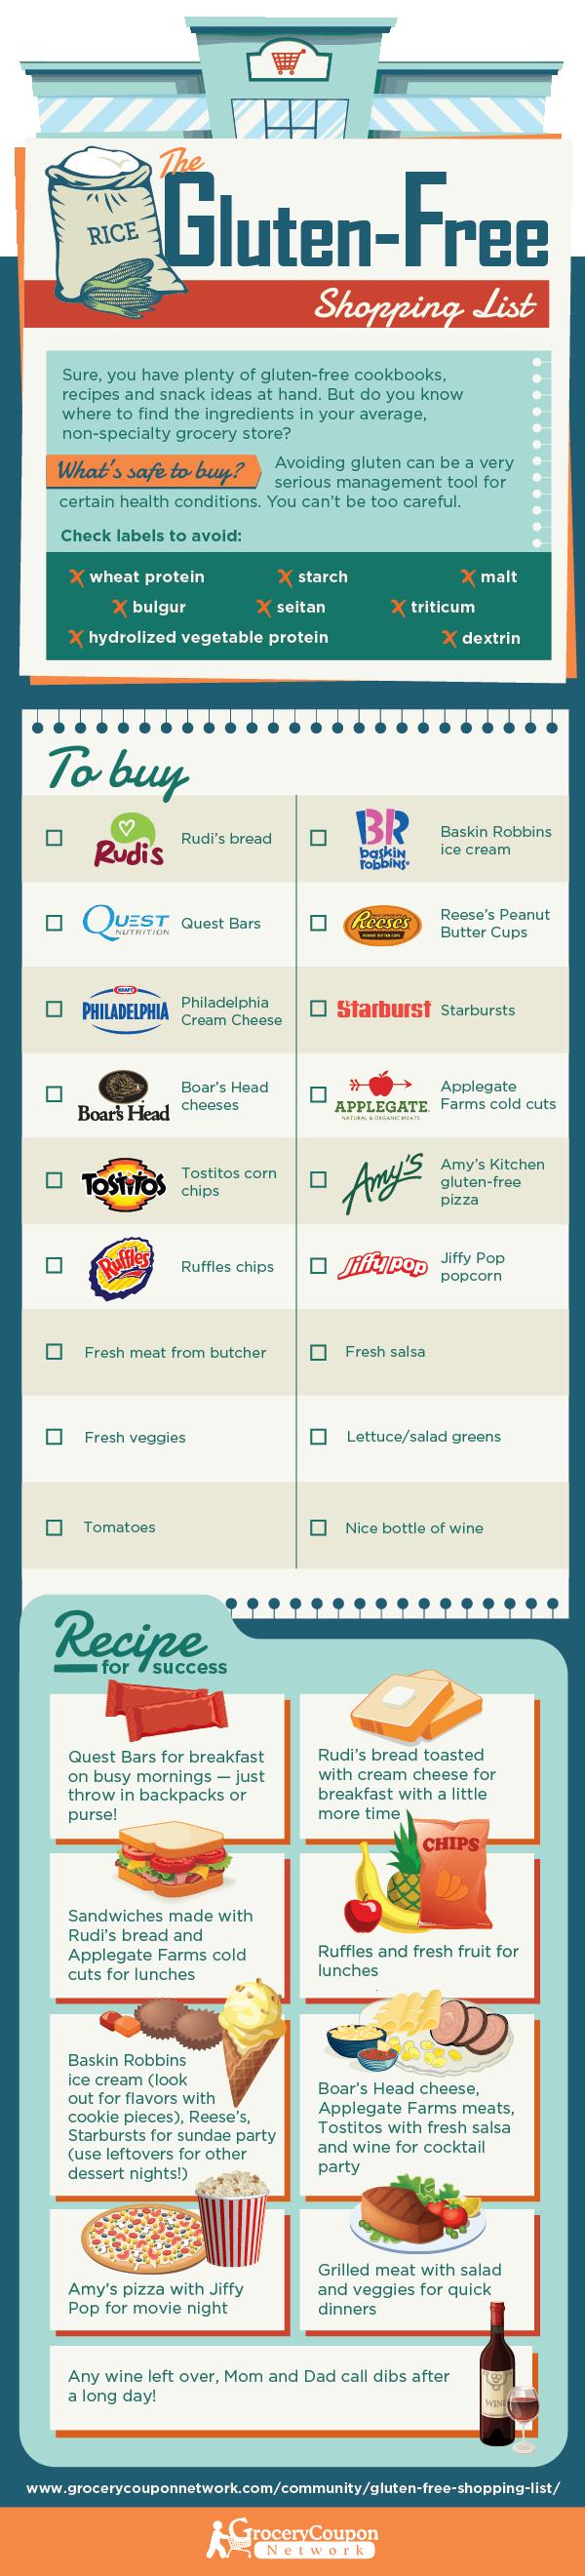 Gluten-Free-Shopping-List